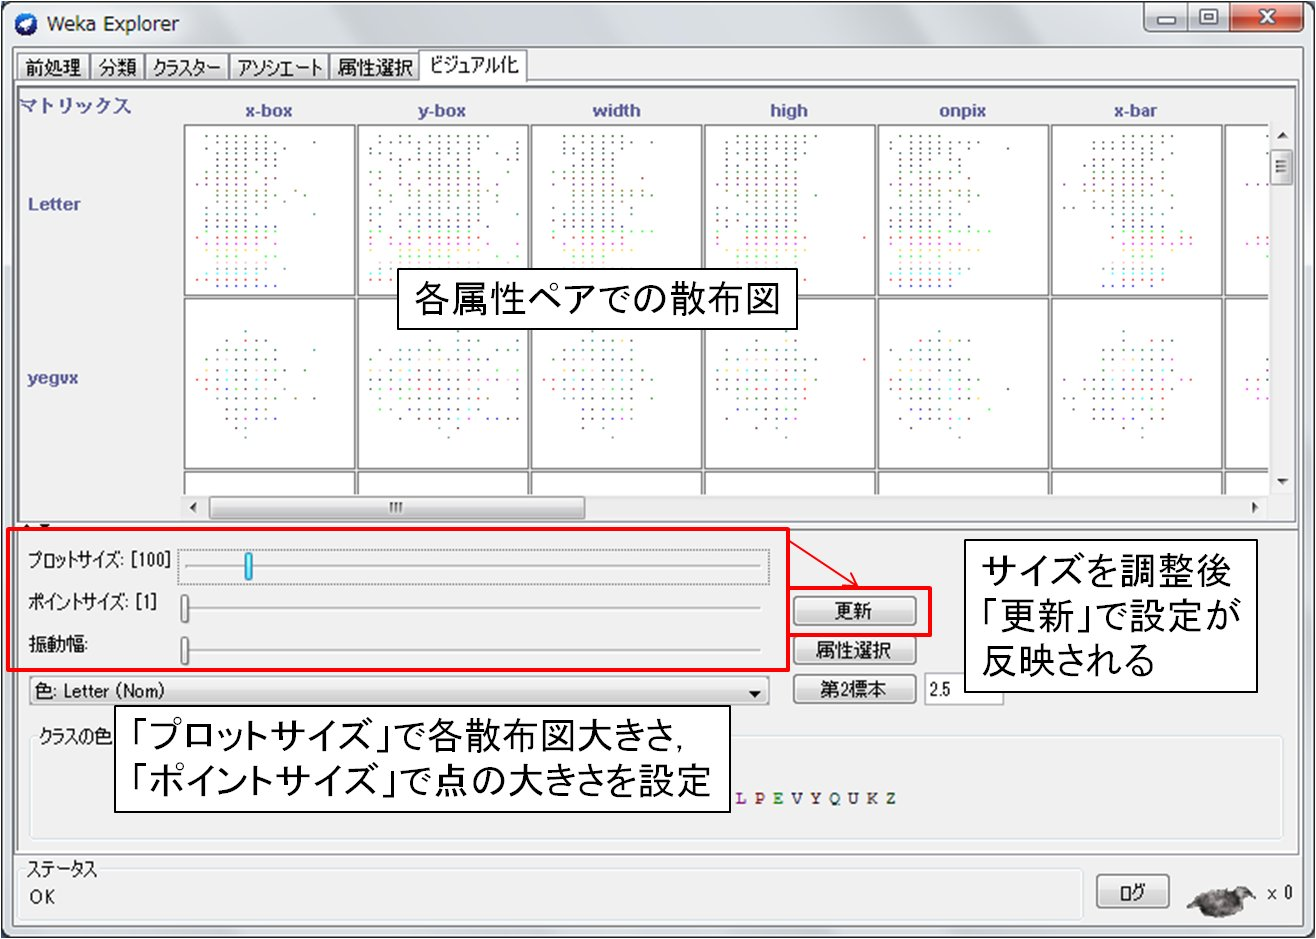 Wekaの視覚化(visualization)パネルでの視覚化